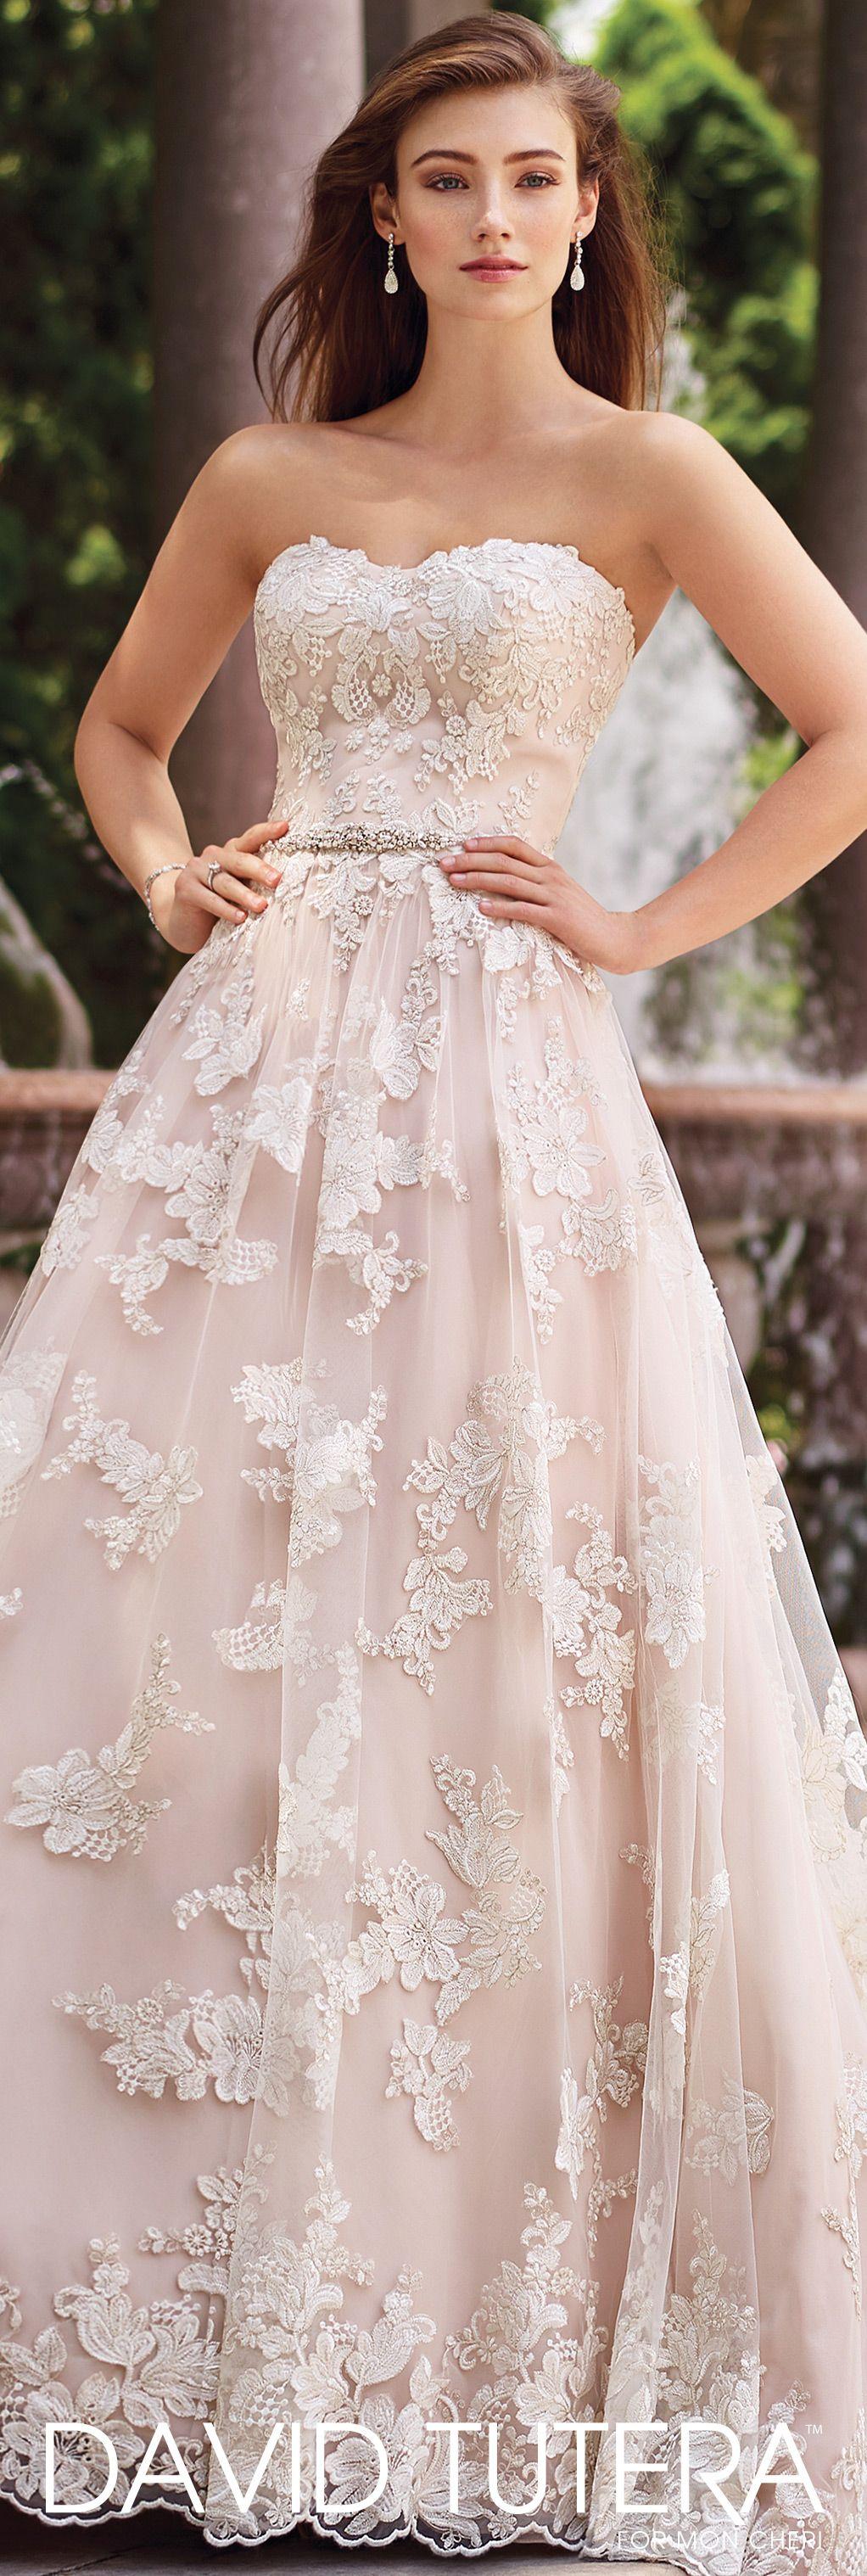 Pink Lace Wedding Dresses